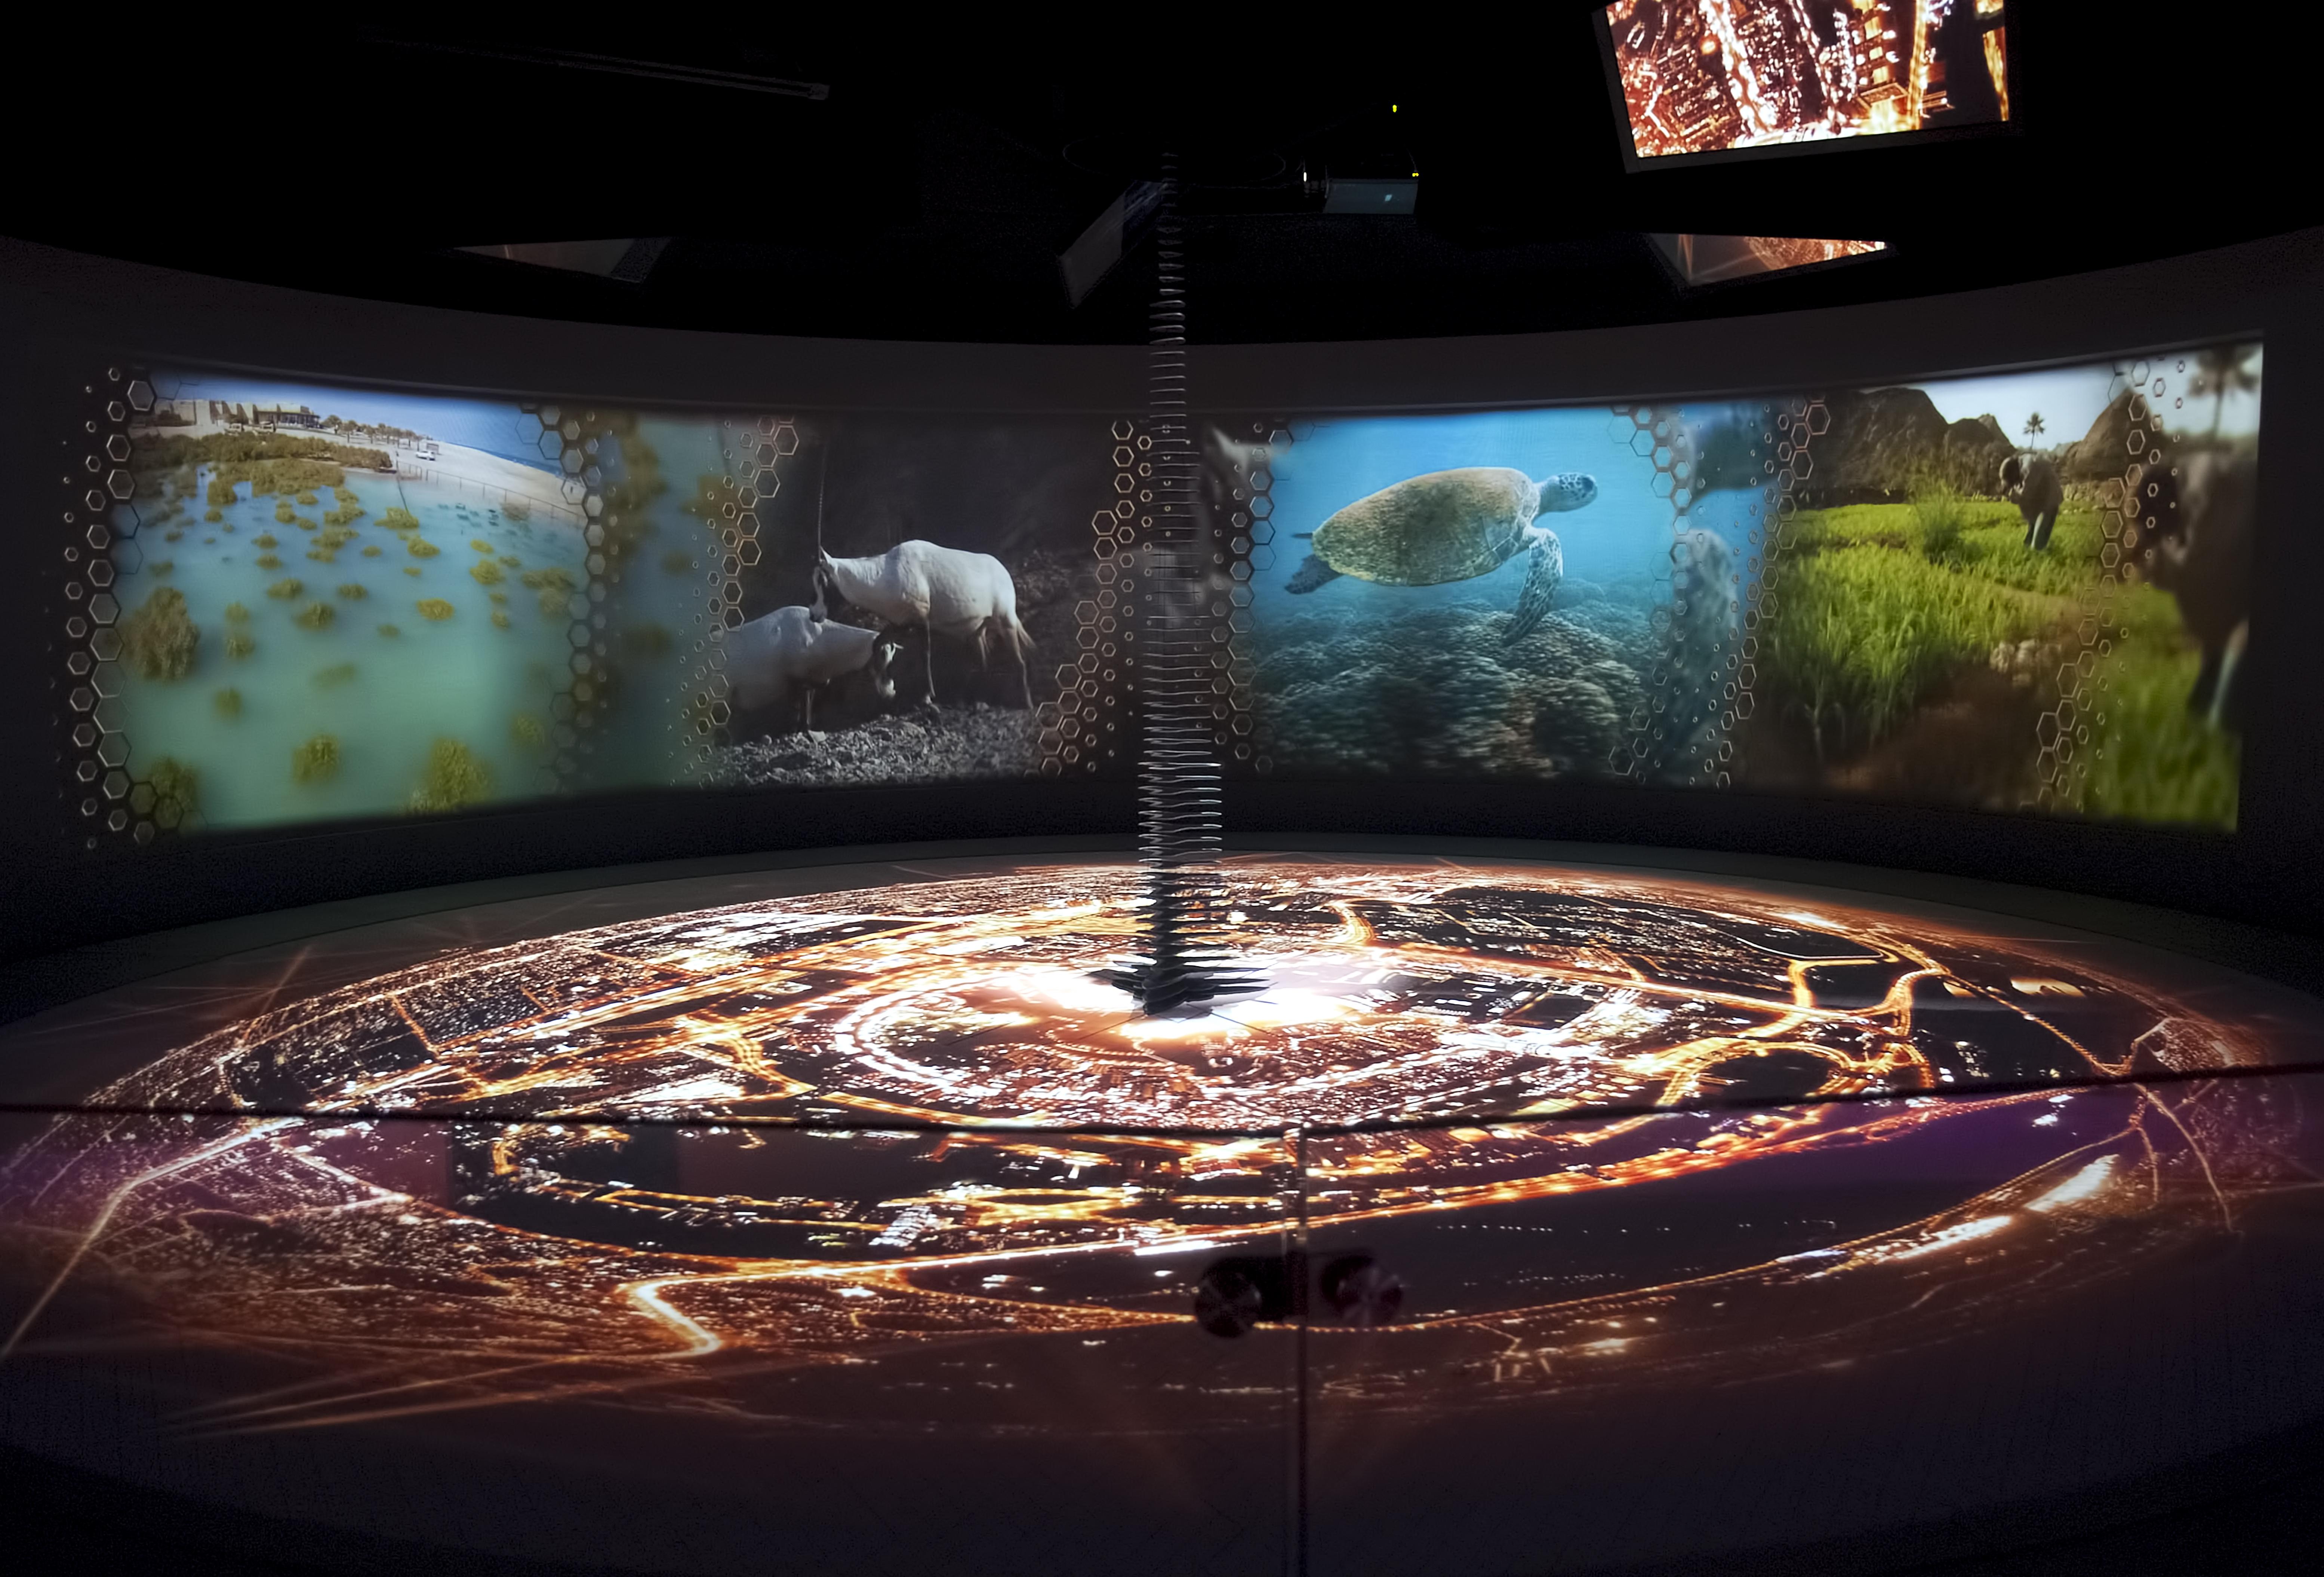 Dubai based Action Impact creates Expo 2020 Dubai experience at the ongoing Expo 2015 Milano